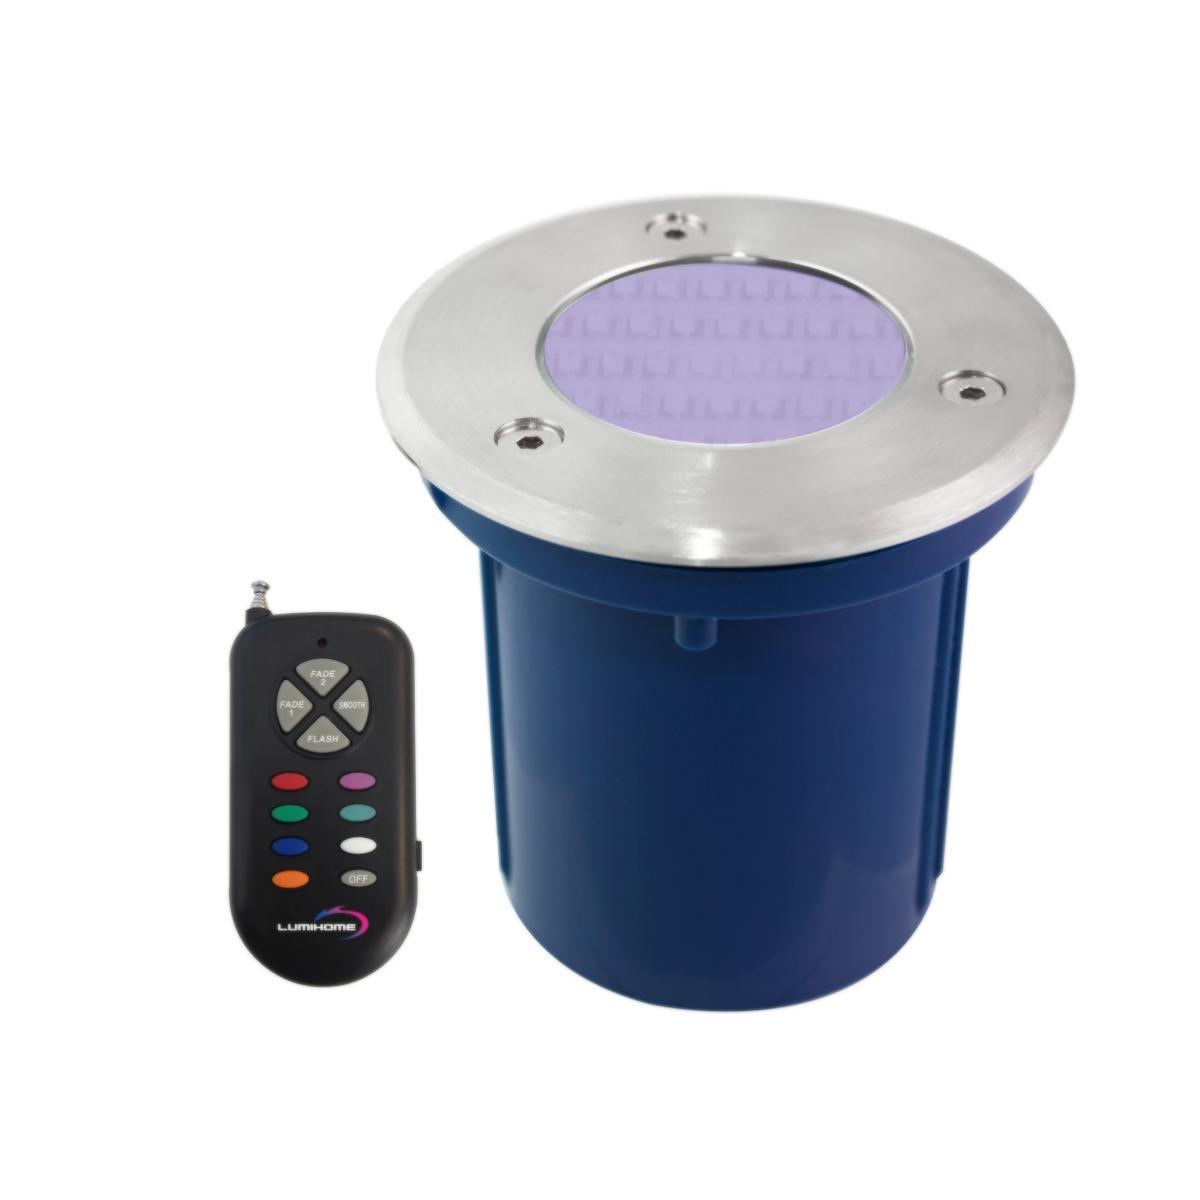 Spot led rgb encastrable inox 316 pour abords piscine 2w - Spot led ip65 12v ...